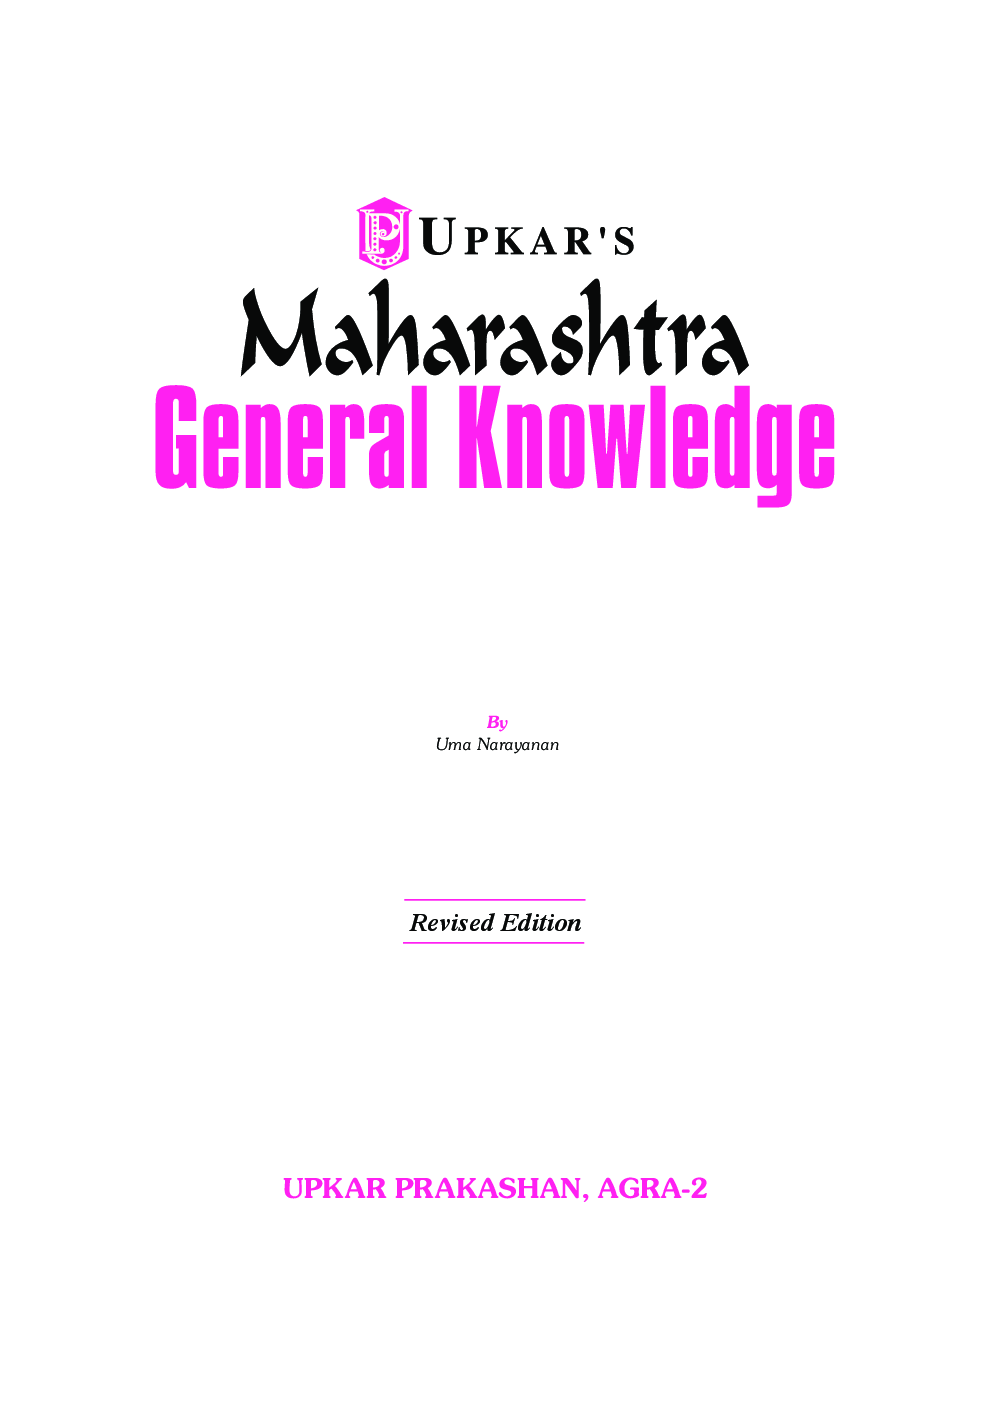 Maharashtra General Knowledge - Page 2